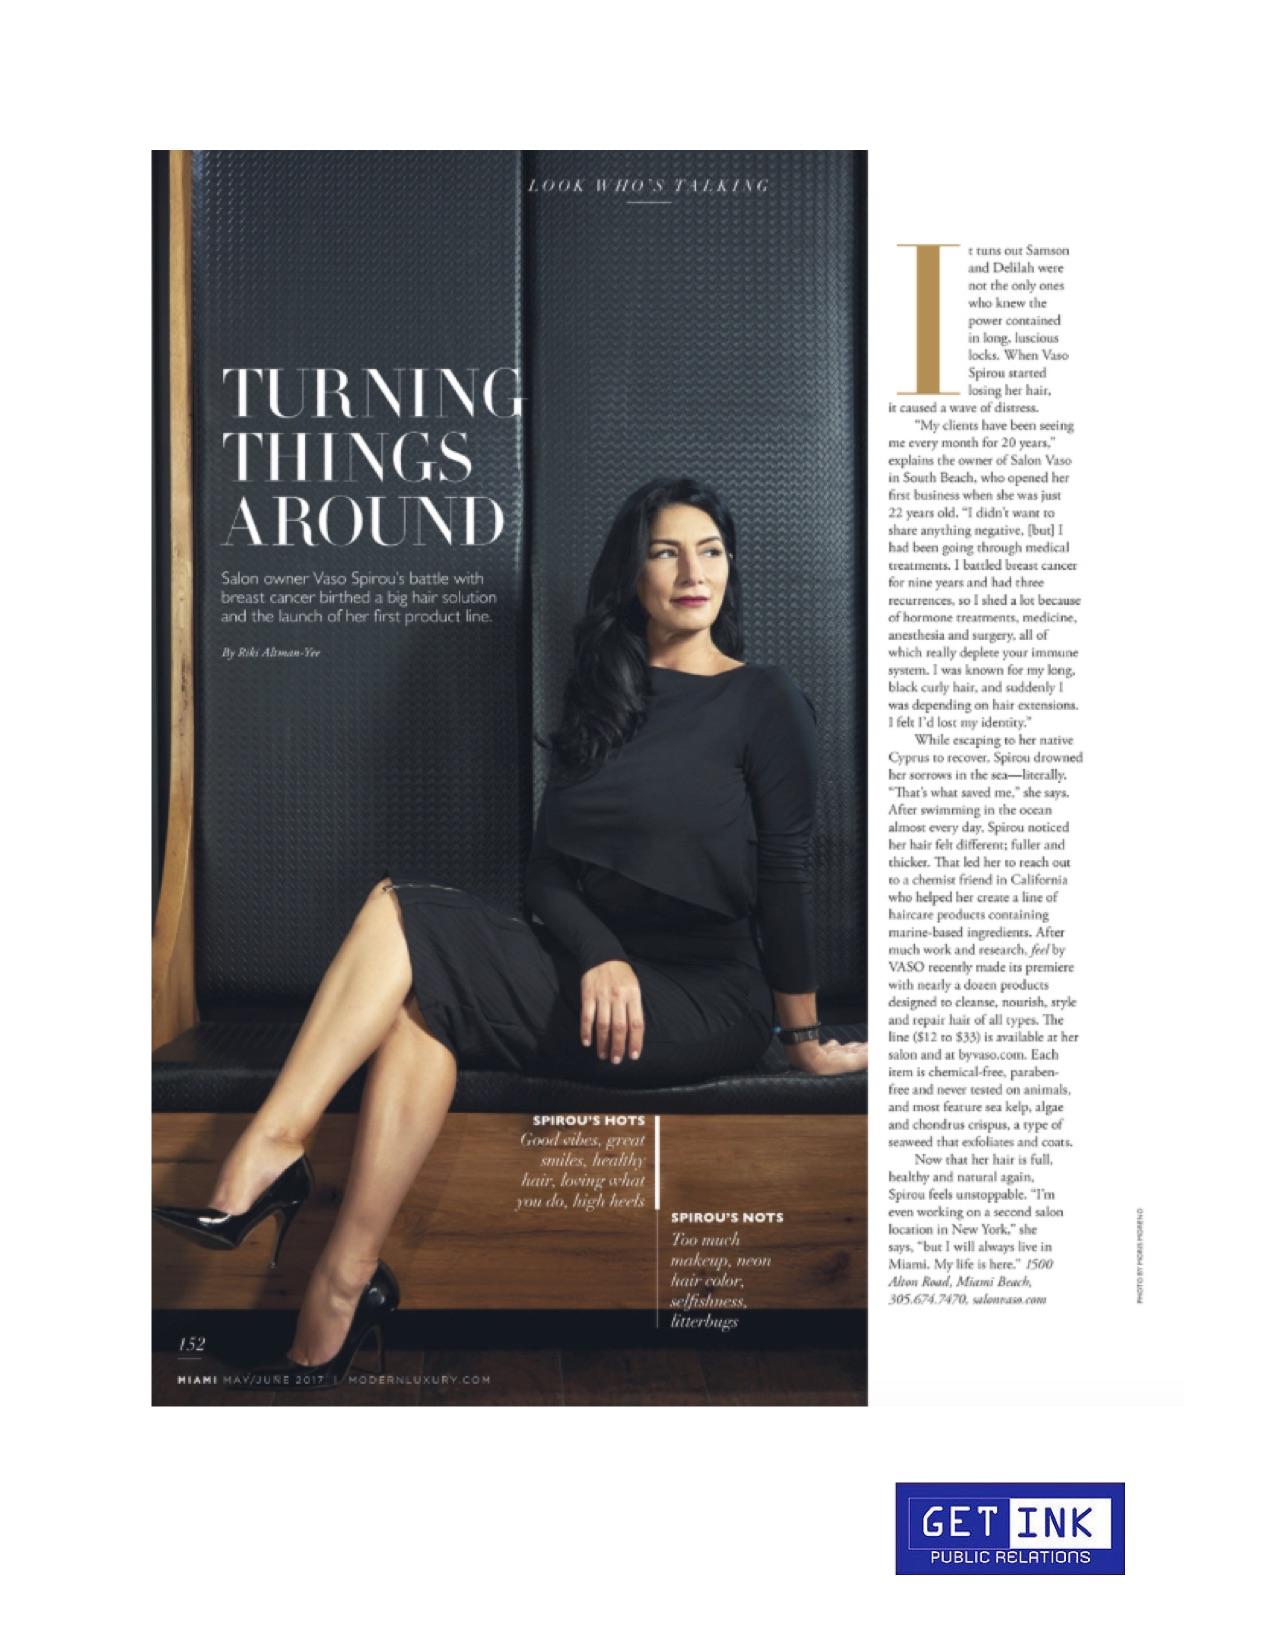 Salon Vaso Miami Magazine - Get Ink PR